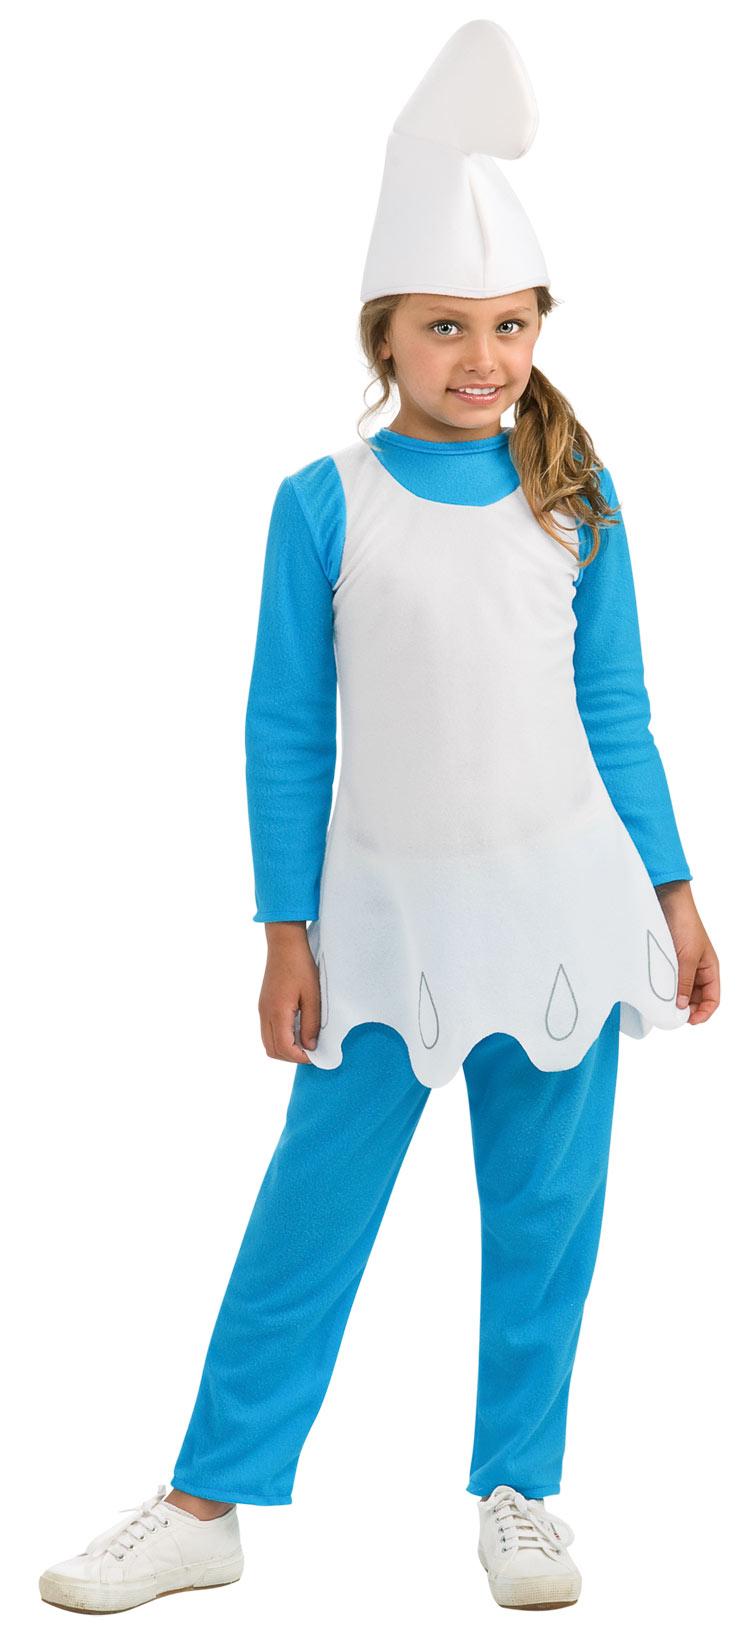 Smurf Costumes (for Men, Women, Kids) | Parties Costume